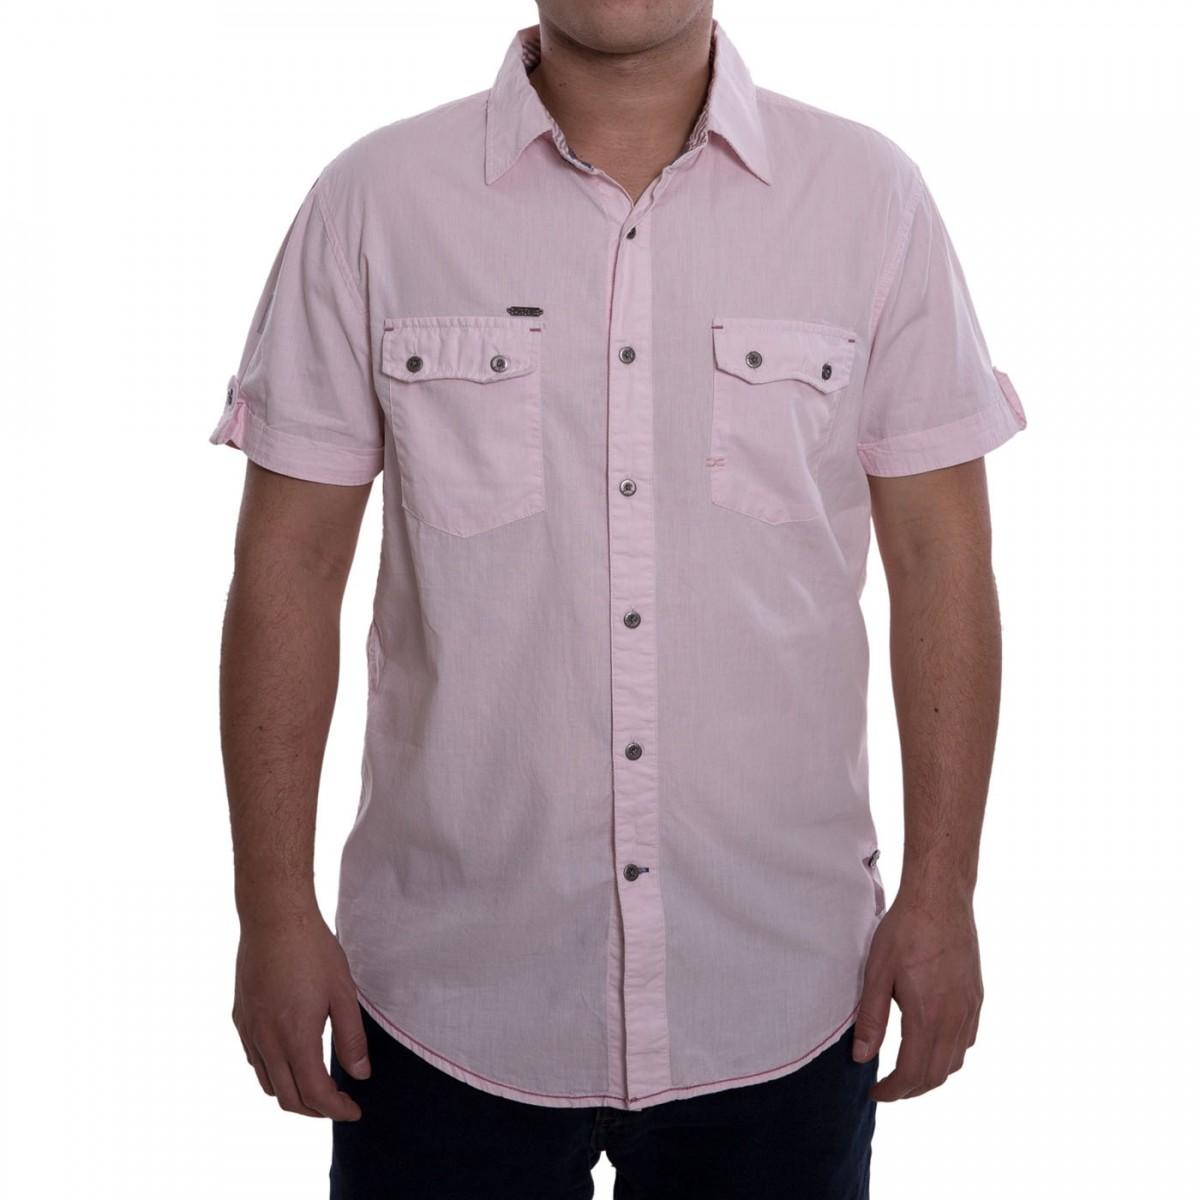 3b0a15c95 Bizz Store - Camisa Social Masculina Dixie Manga Curta Rosa/Azul